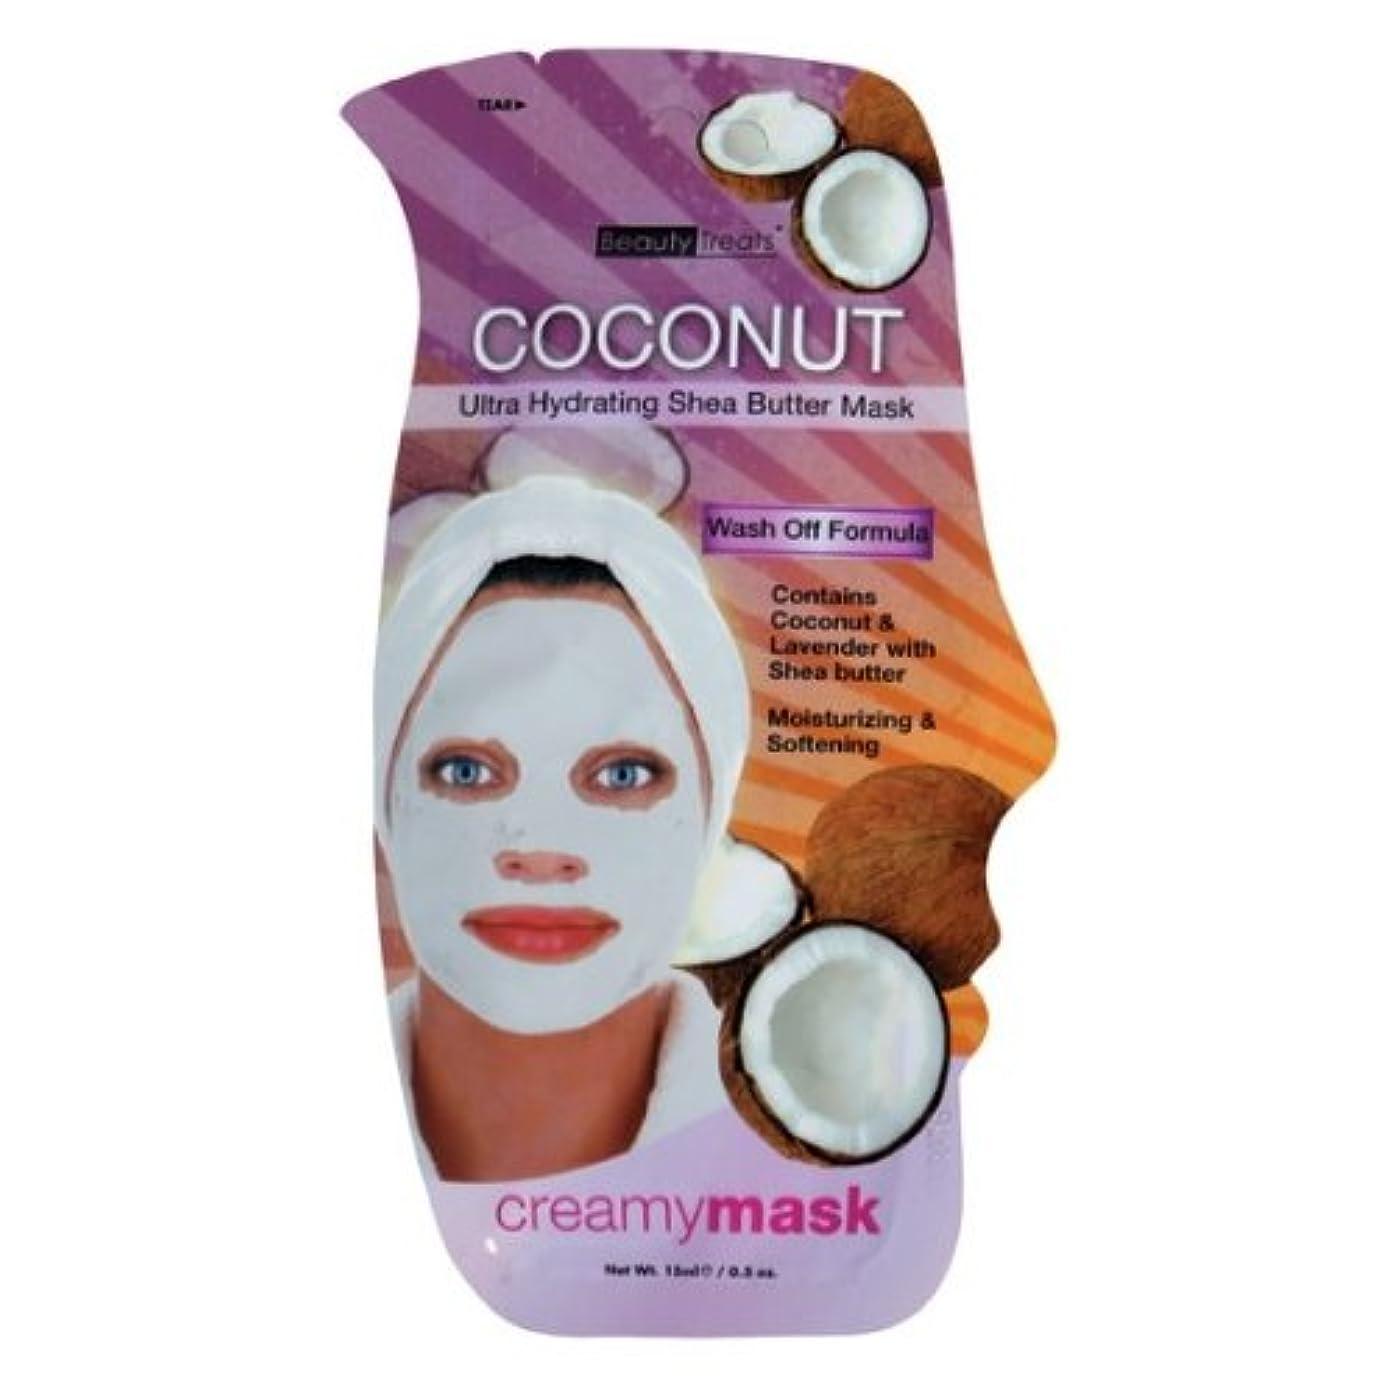 BEAUTY TREATS Coconut Ultra Hydrating Shea Butter Mask - Coconut (並行輸入品)